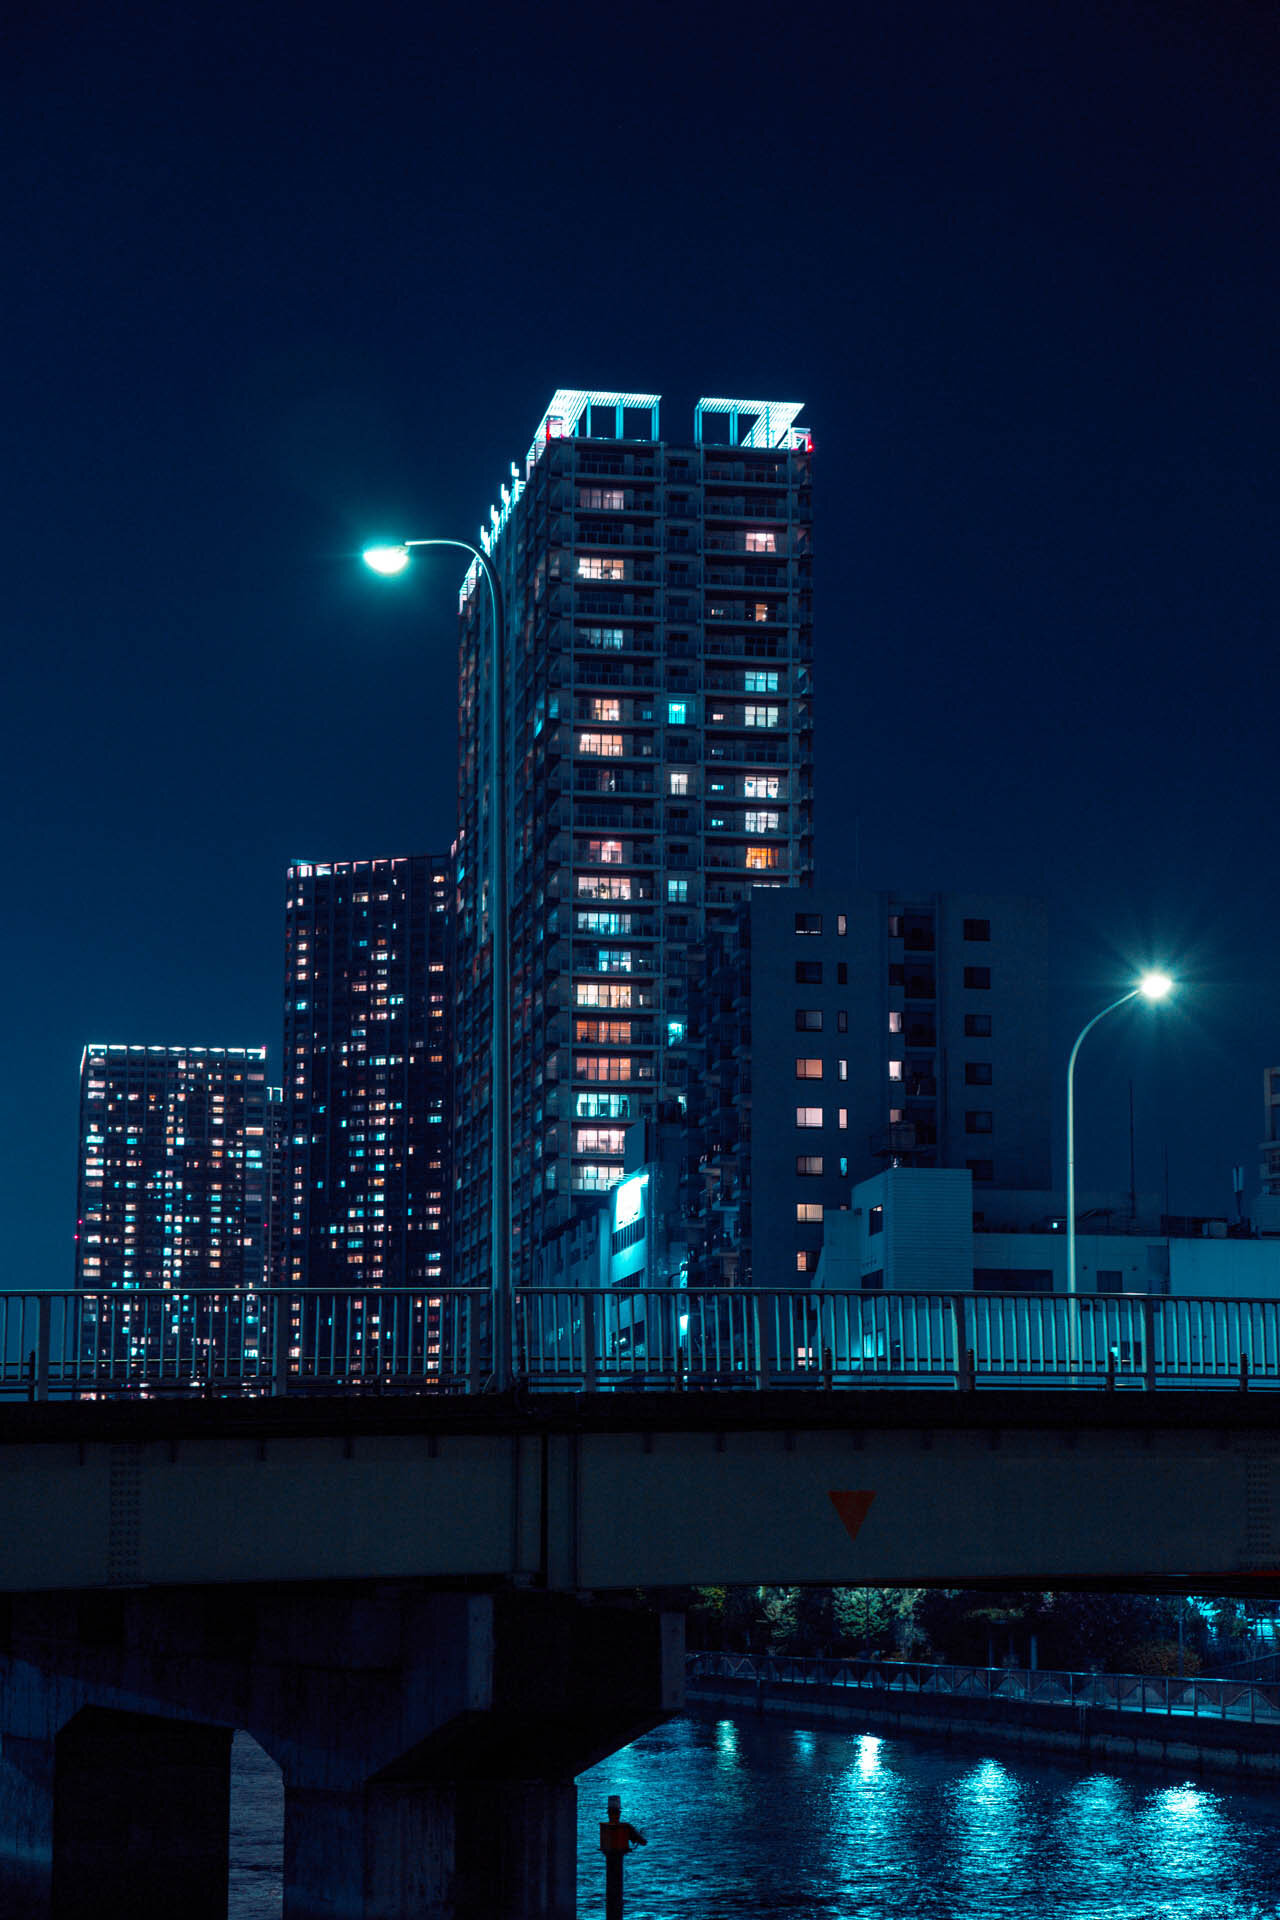 silent-city-6.jpg